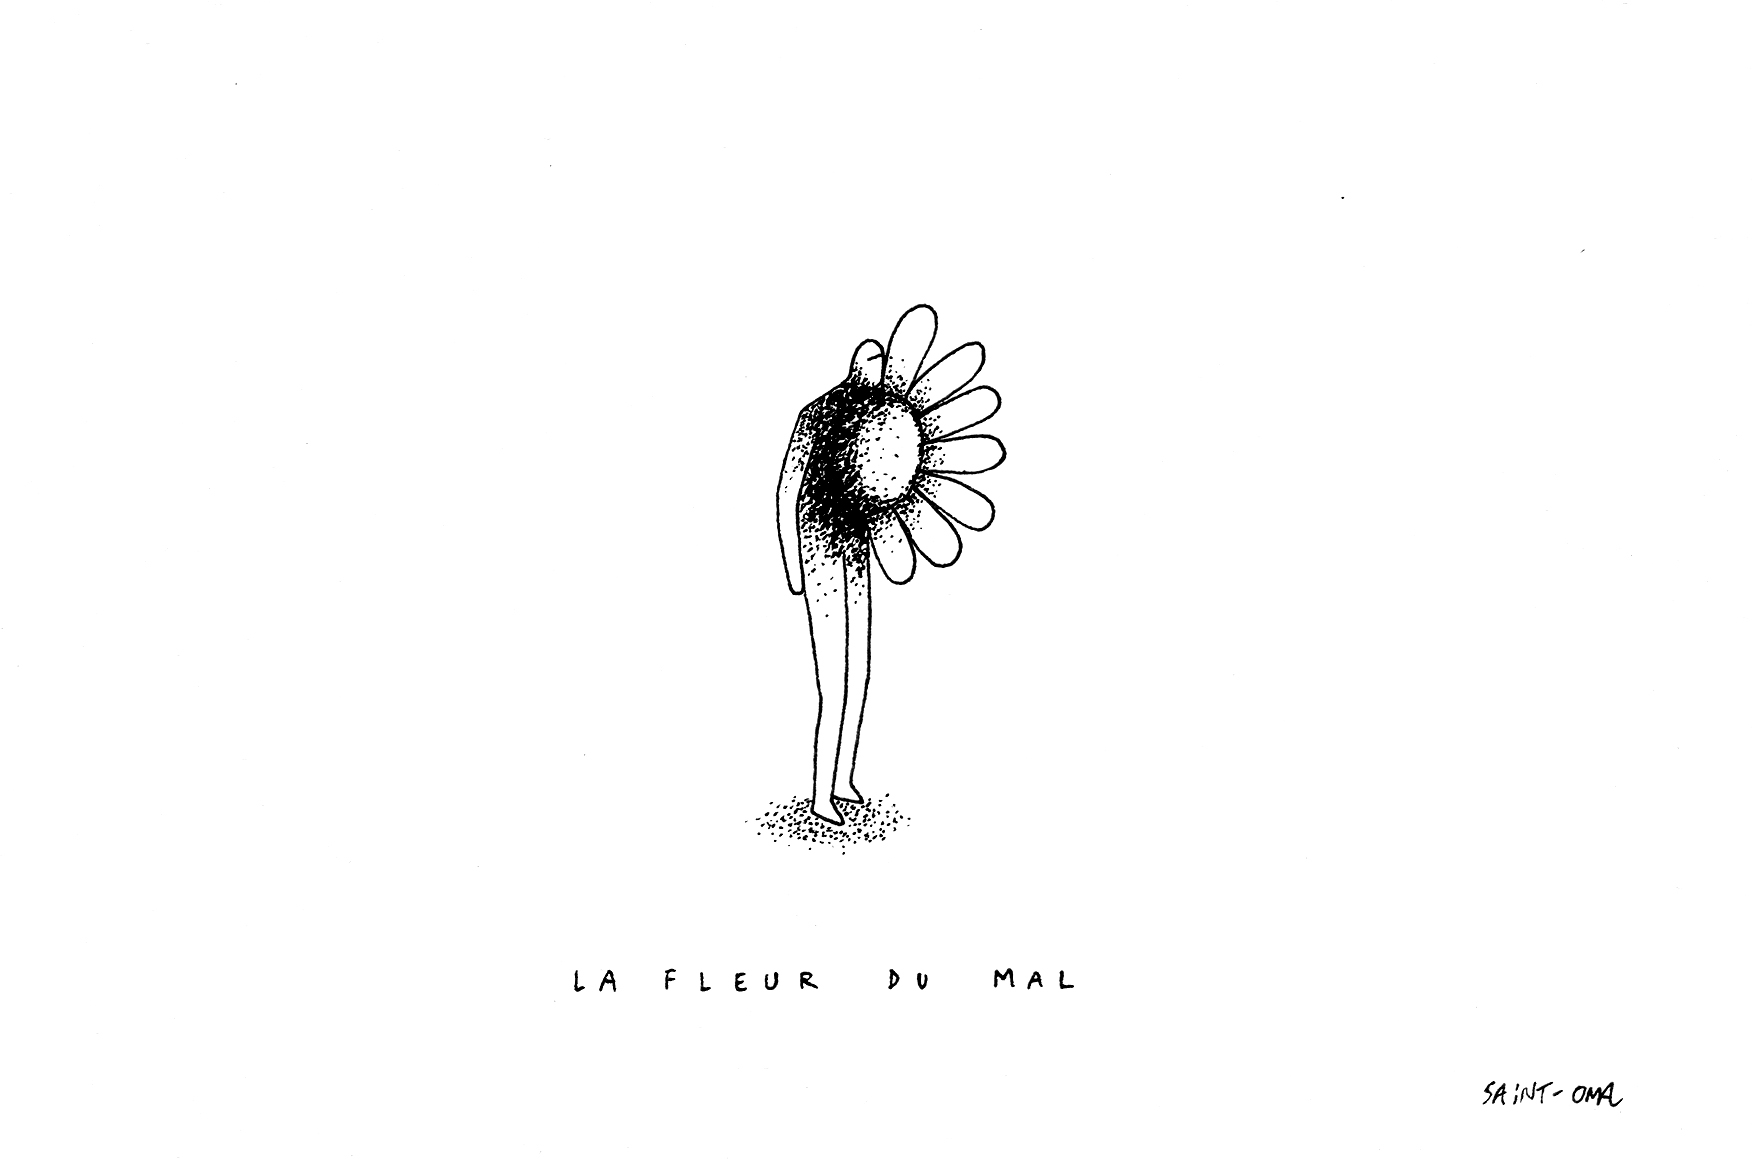 La fleur du mal ORIGINAUX copie